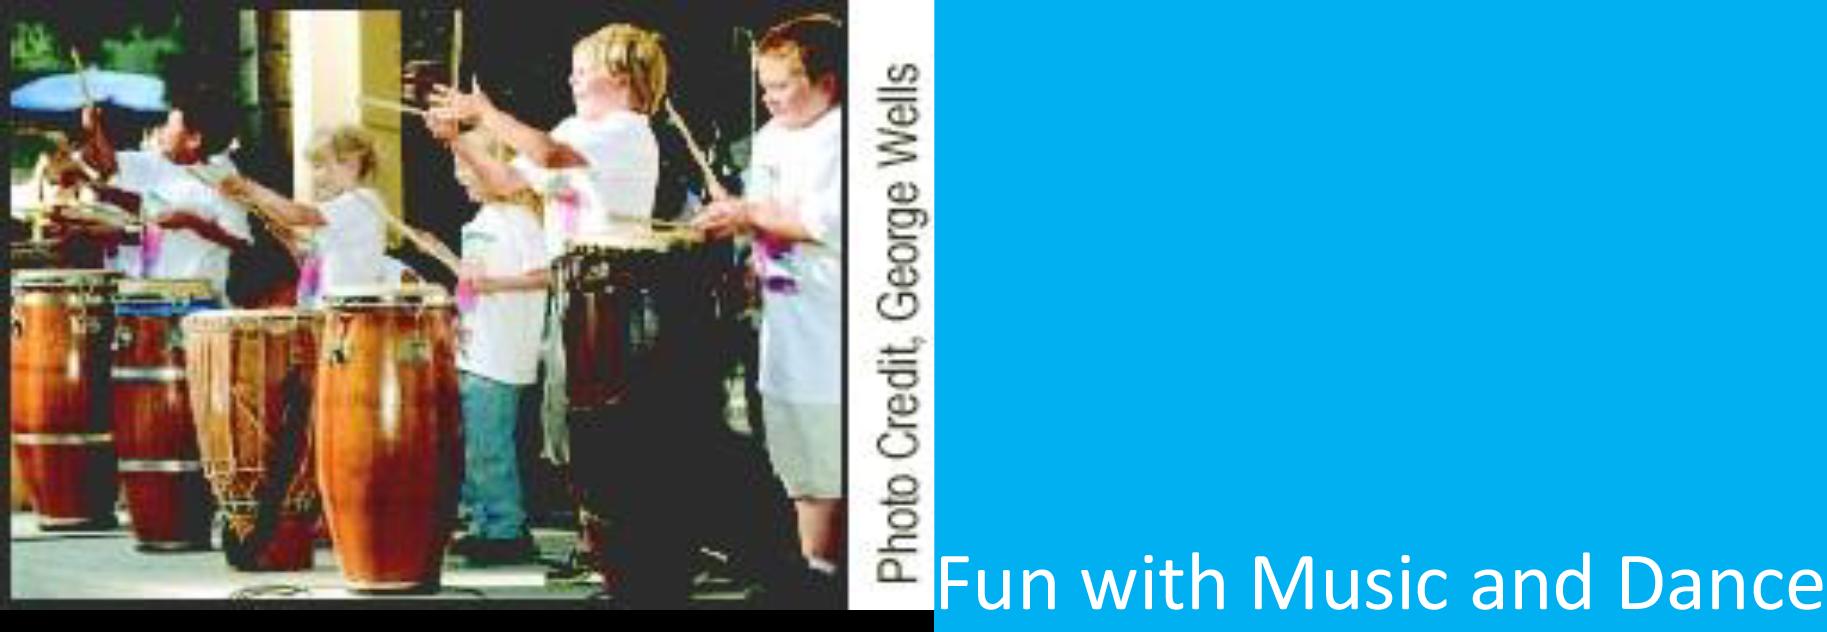 snap-drumming-and-dance-description